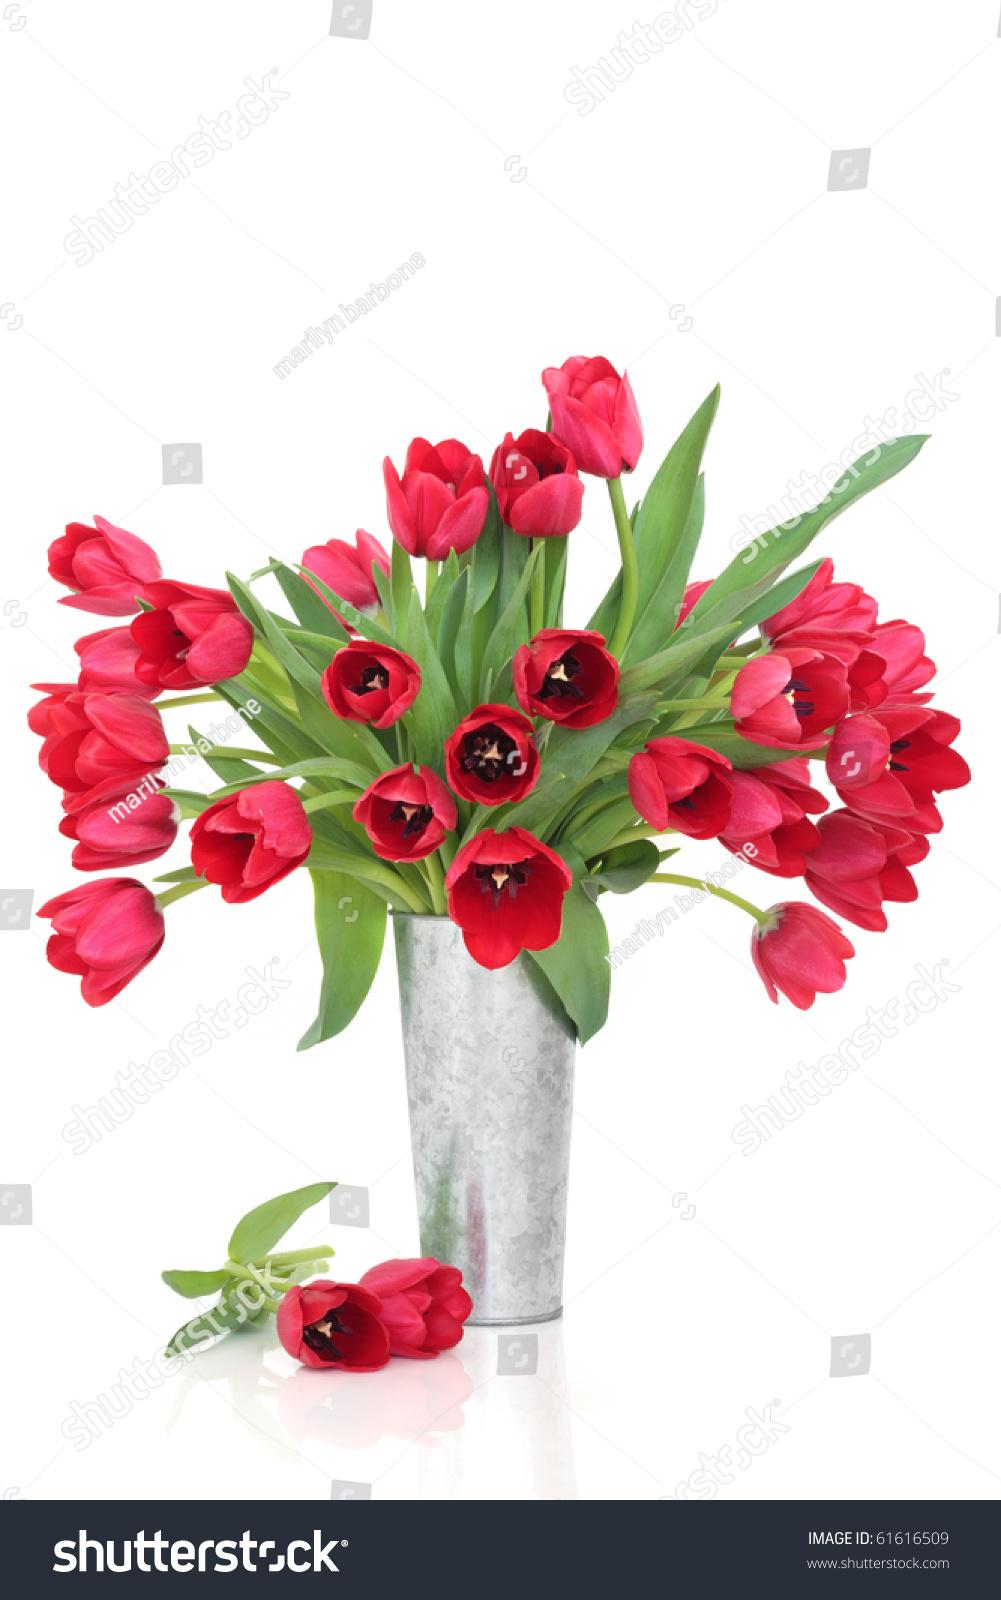 Red Tulip Flower Arrangement Distressed Aluminum Stock Photo 61616509  Shutterstock